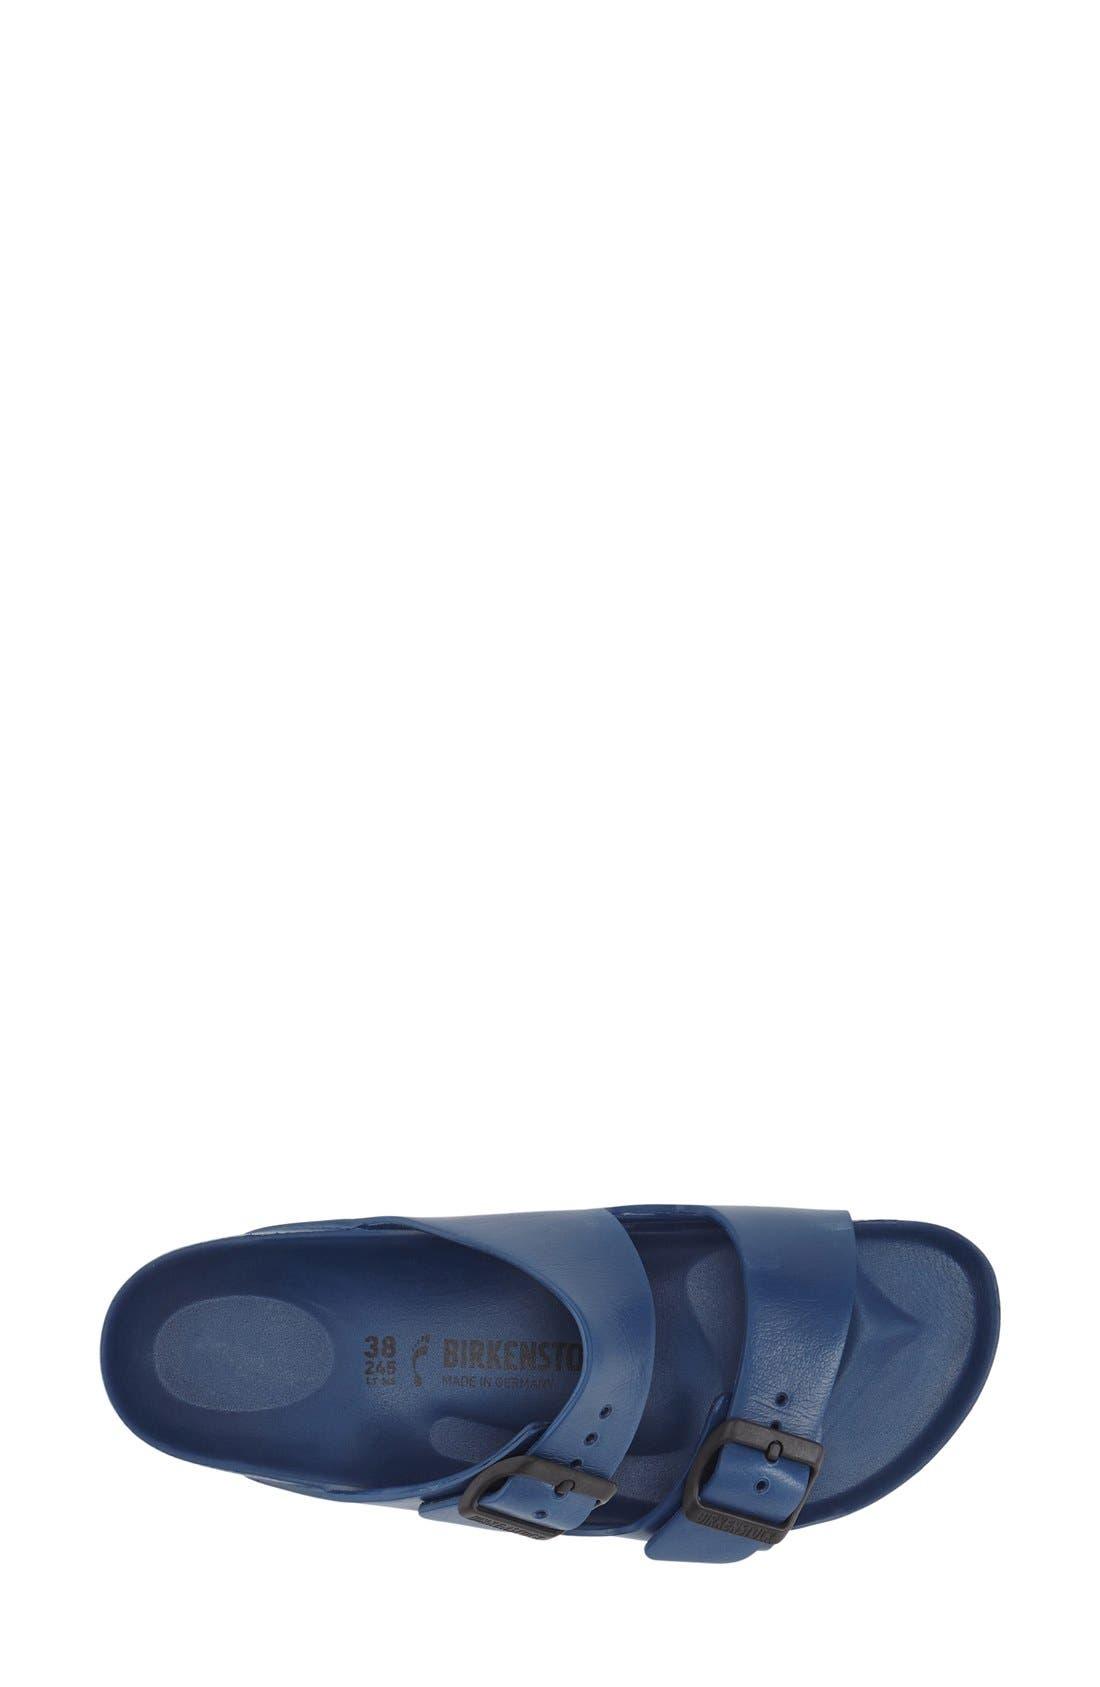 Essentials - Arizona Slide Sandal,                             Alternate thumbnail 3, color,                             Navy Eva